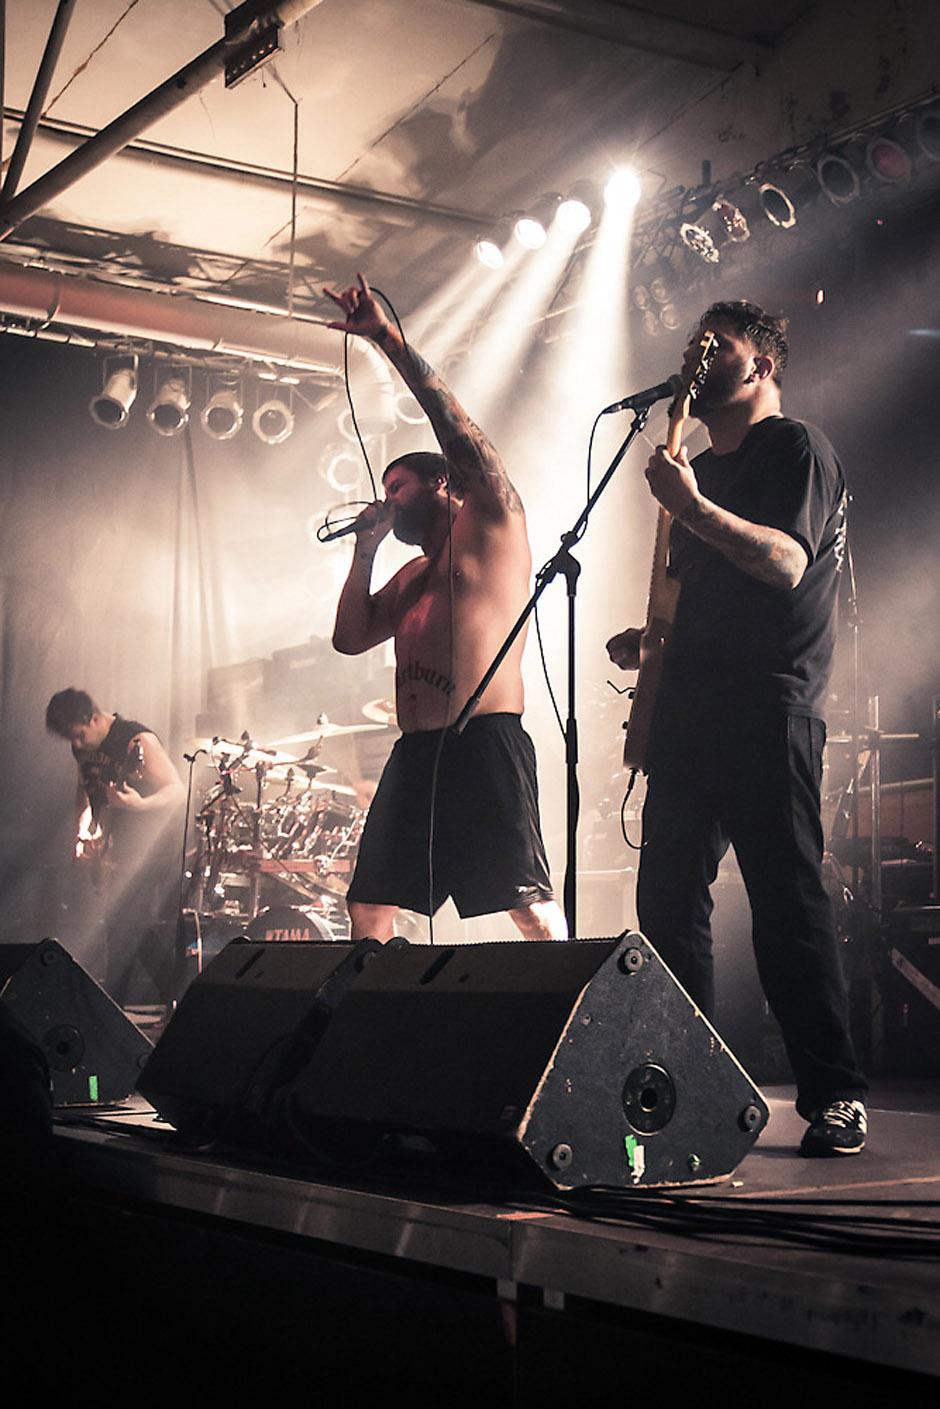 The Black Dahlia Murder live, 20.02.2013, Köln